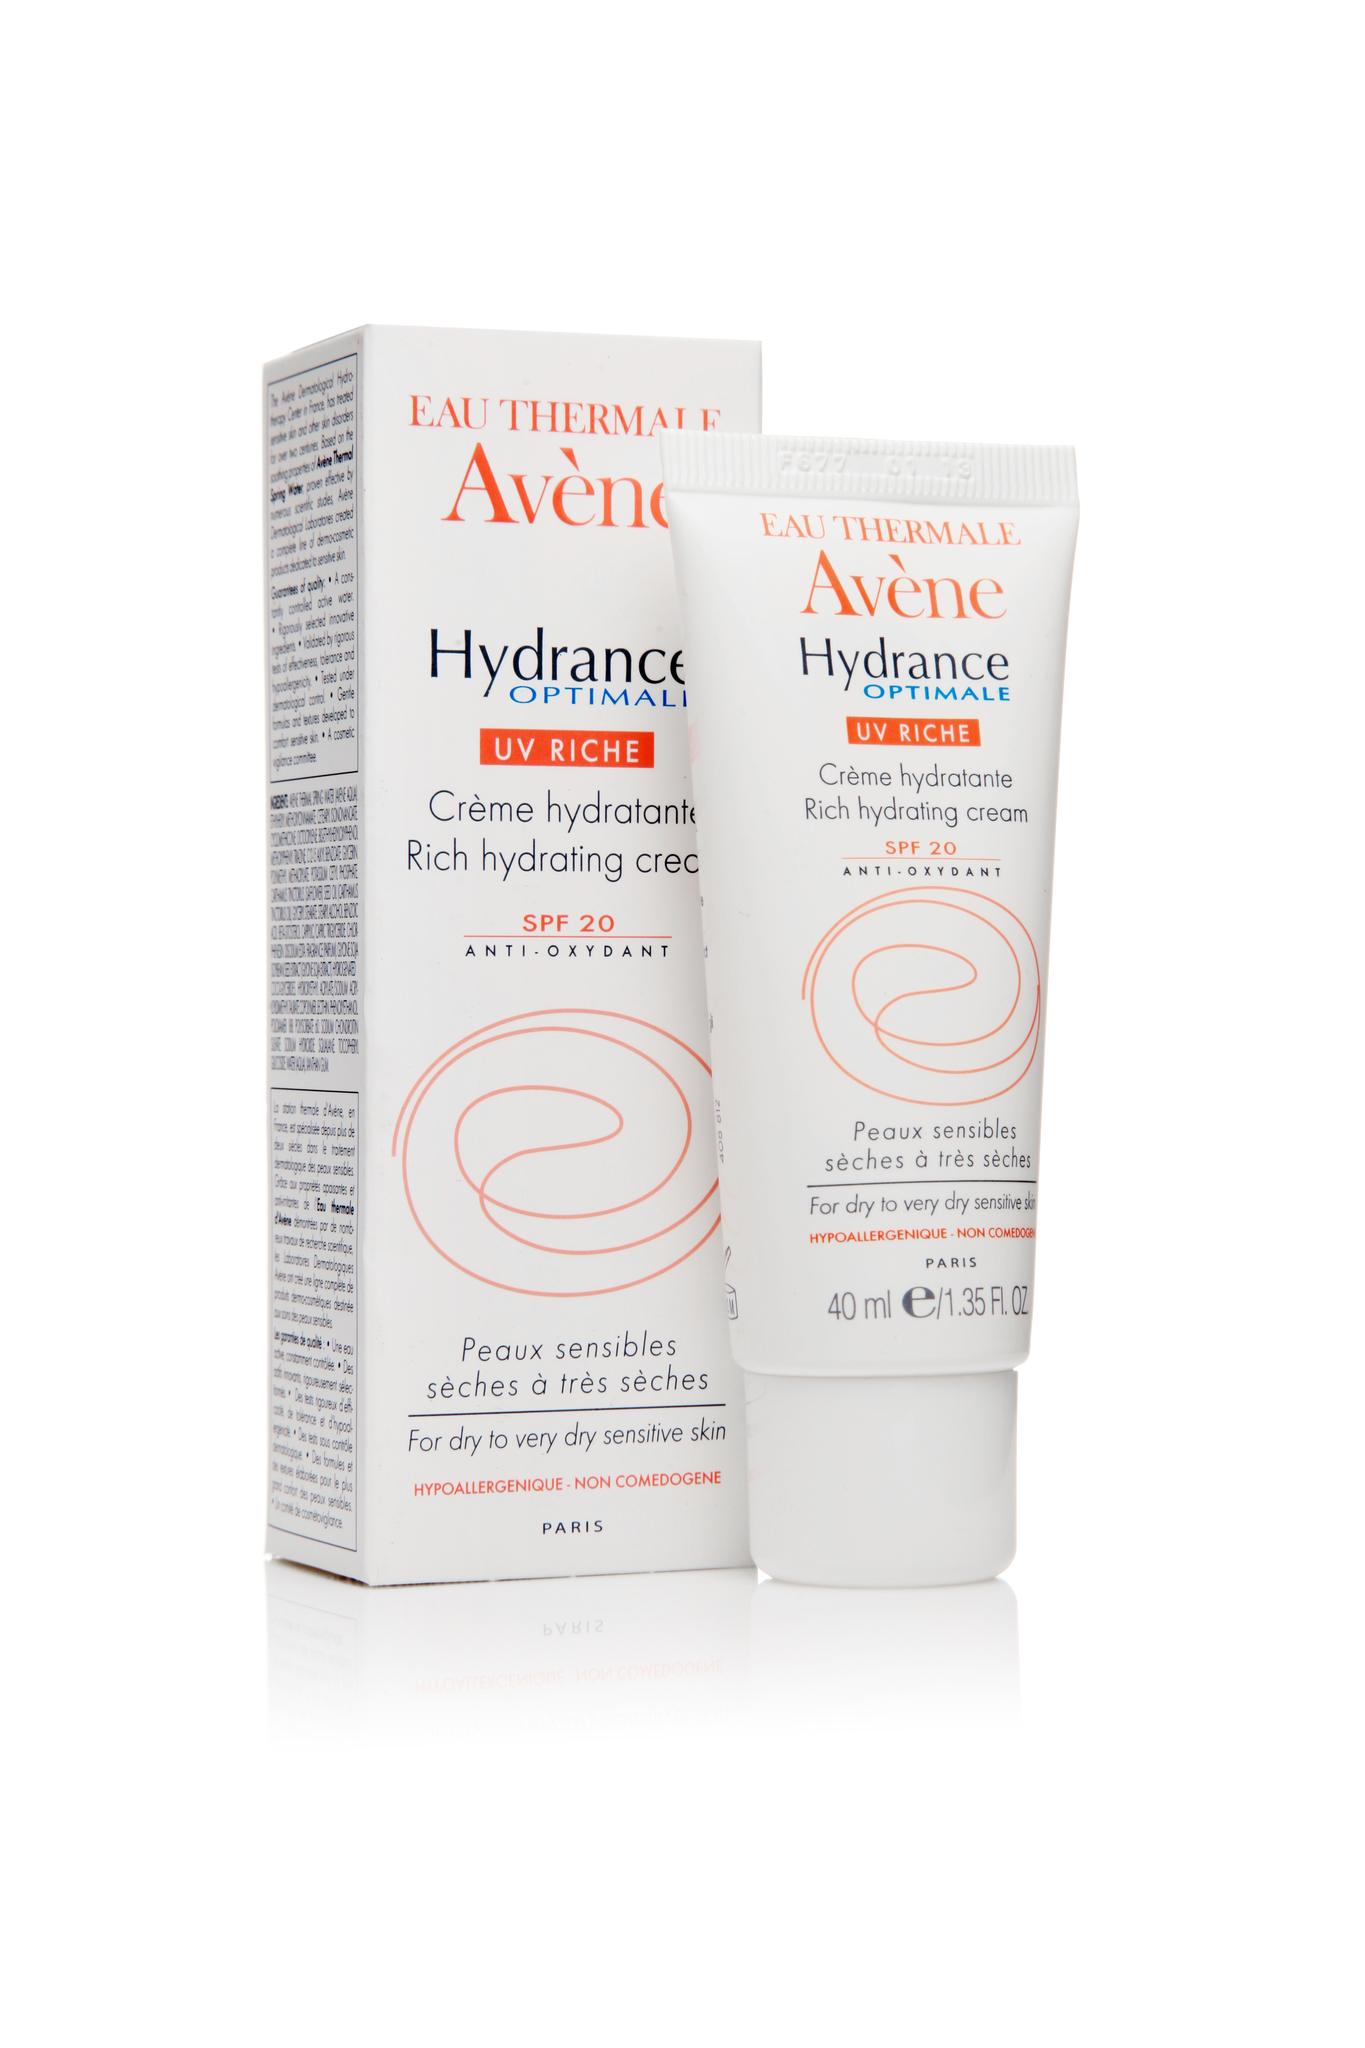 Avene Hydrance optimale UV RICHIE увлажняющий защитный крем для сухой кожи 40 мл.